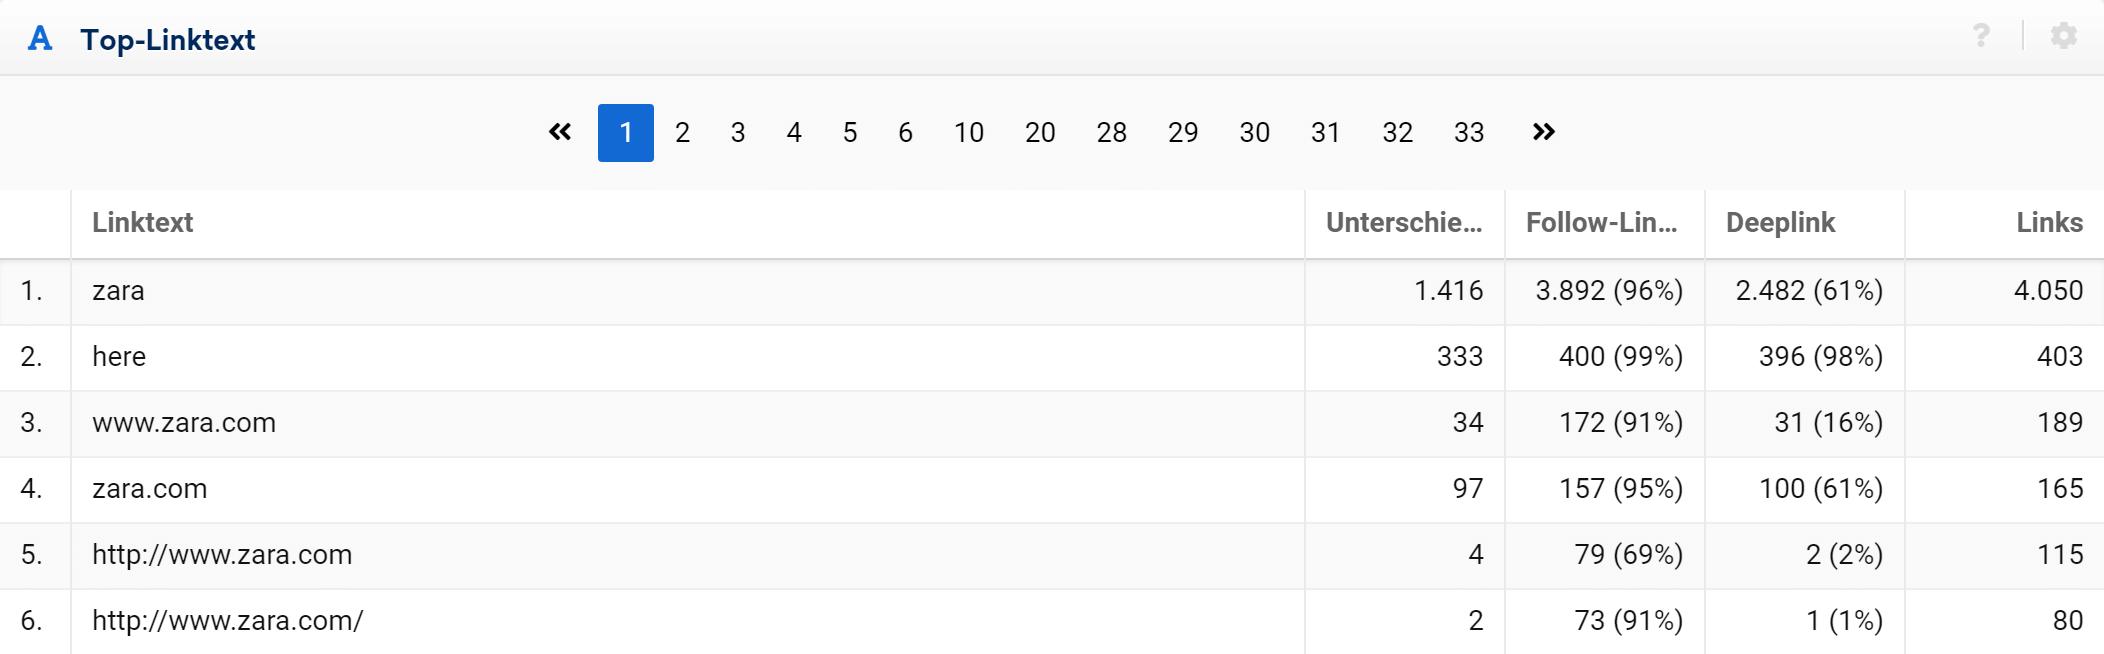 Linktext-Tabelle in einem LinkRating Projekt